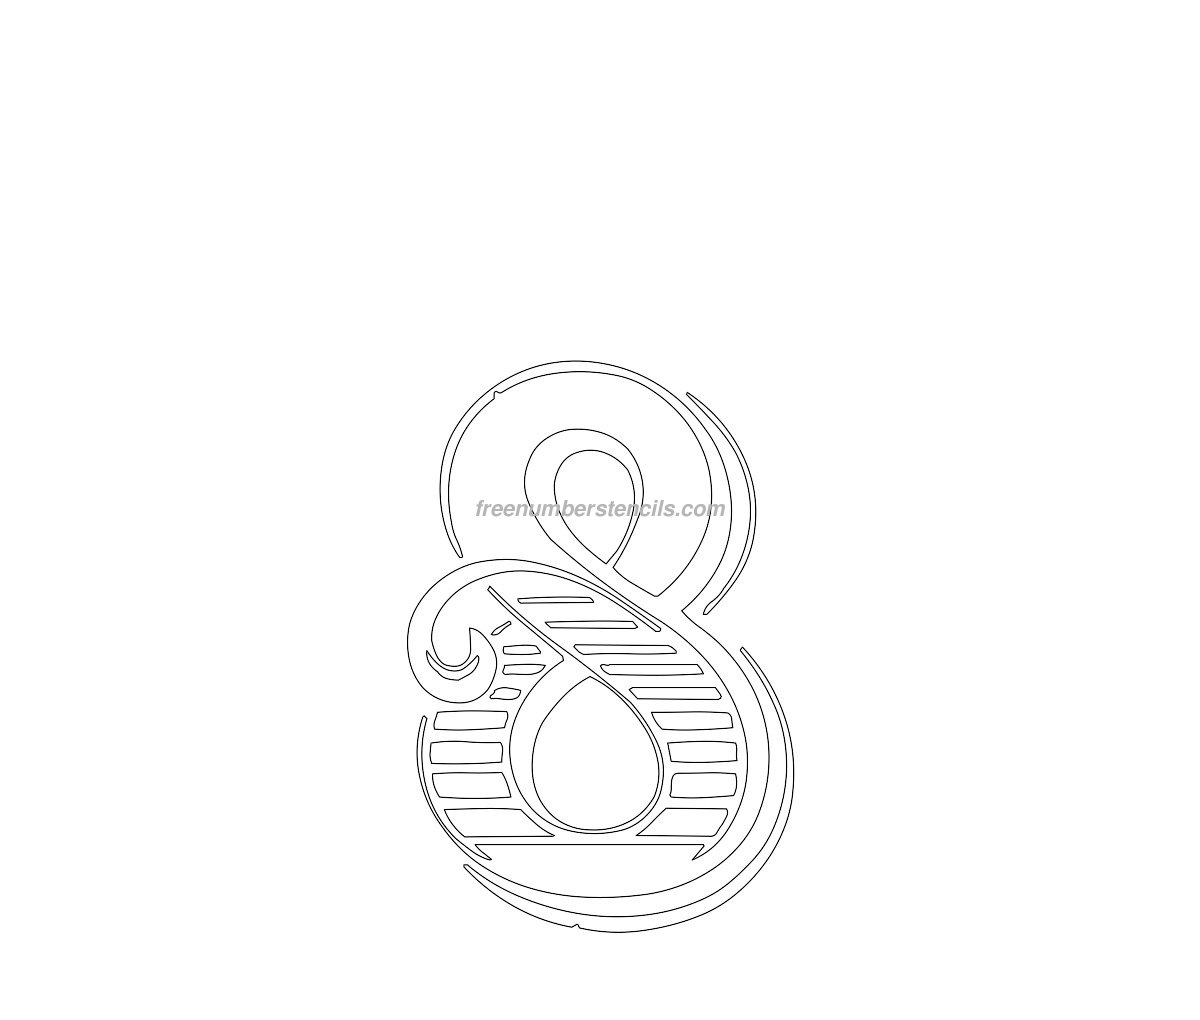 Free Decorative 8 Number Stencil - Freenumberstencils.com